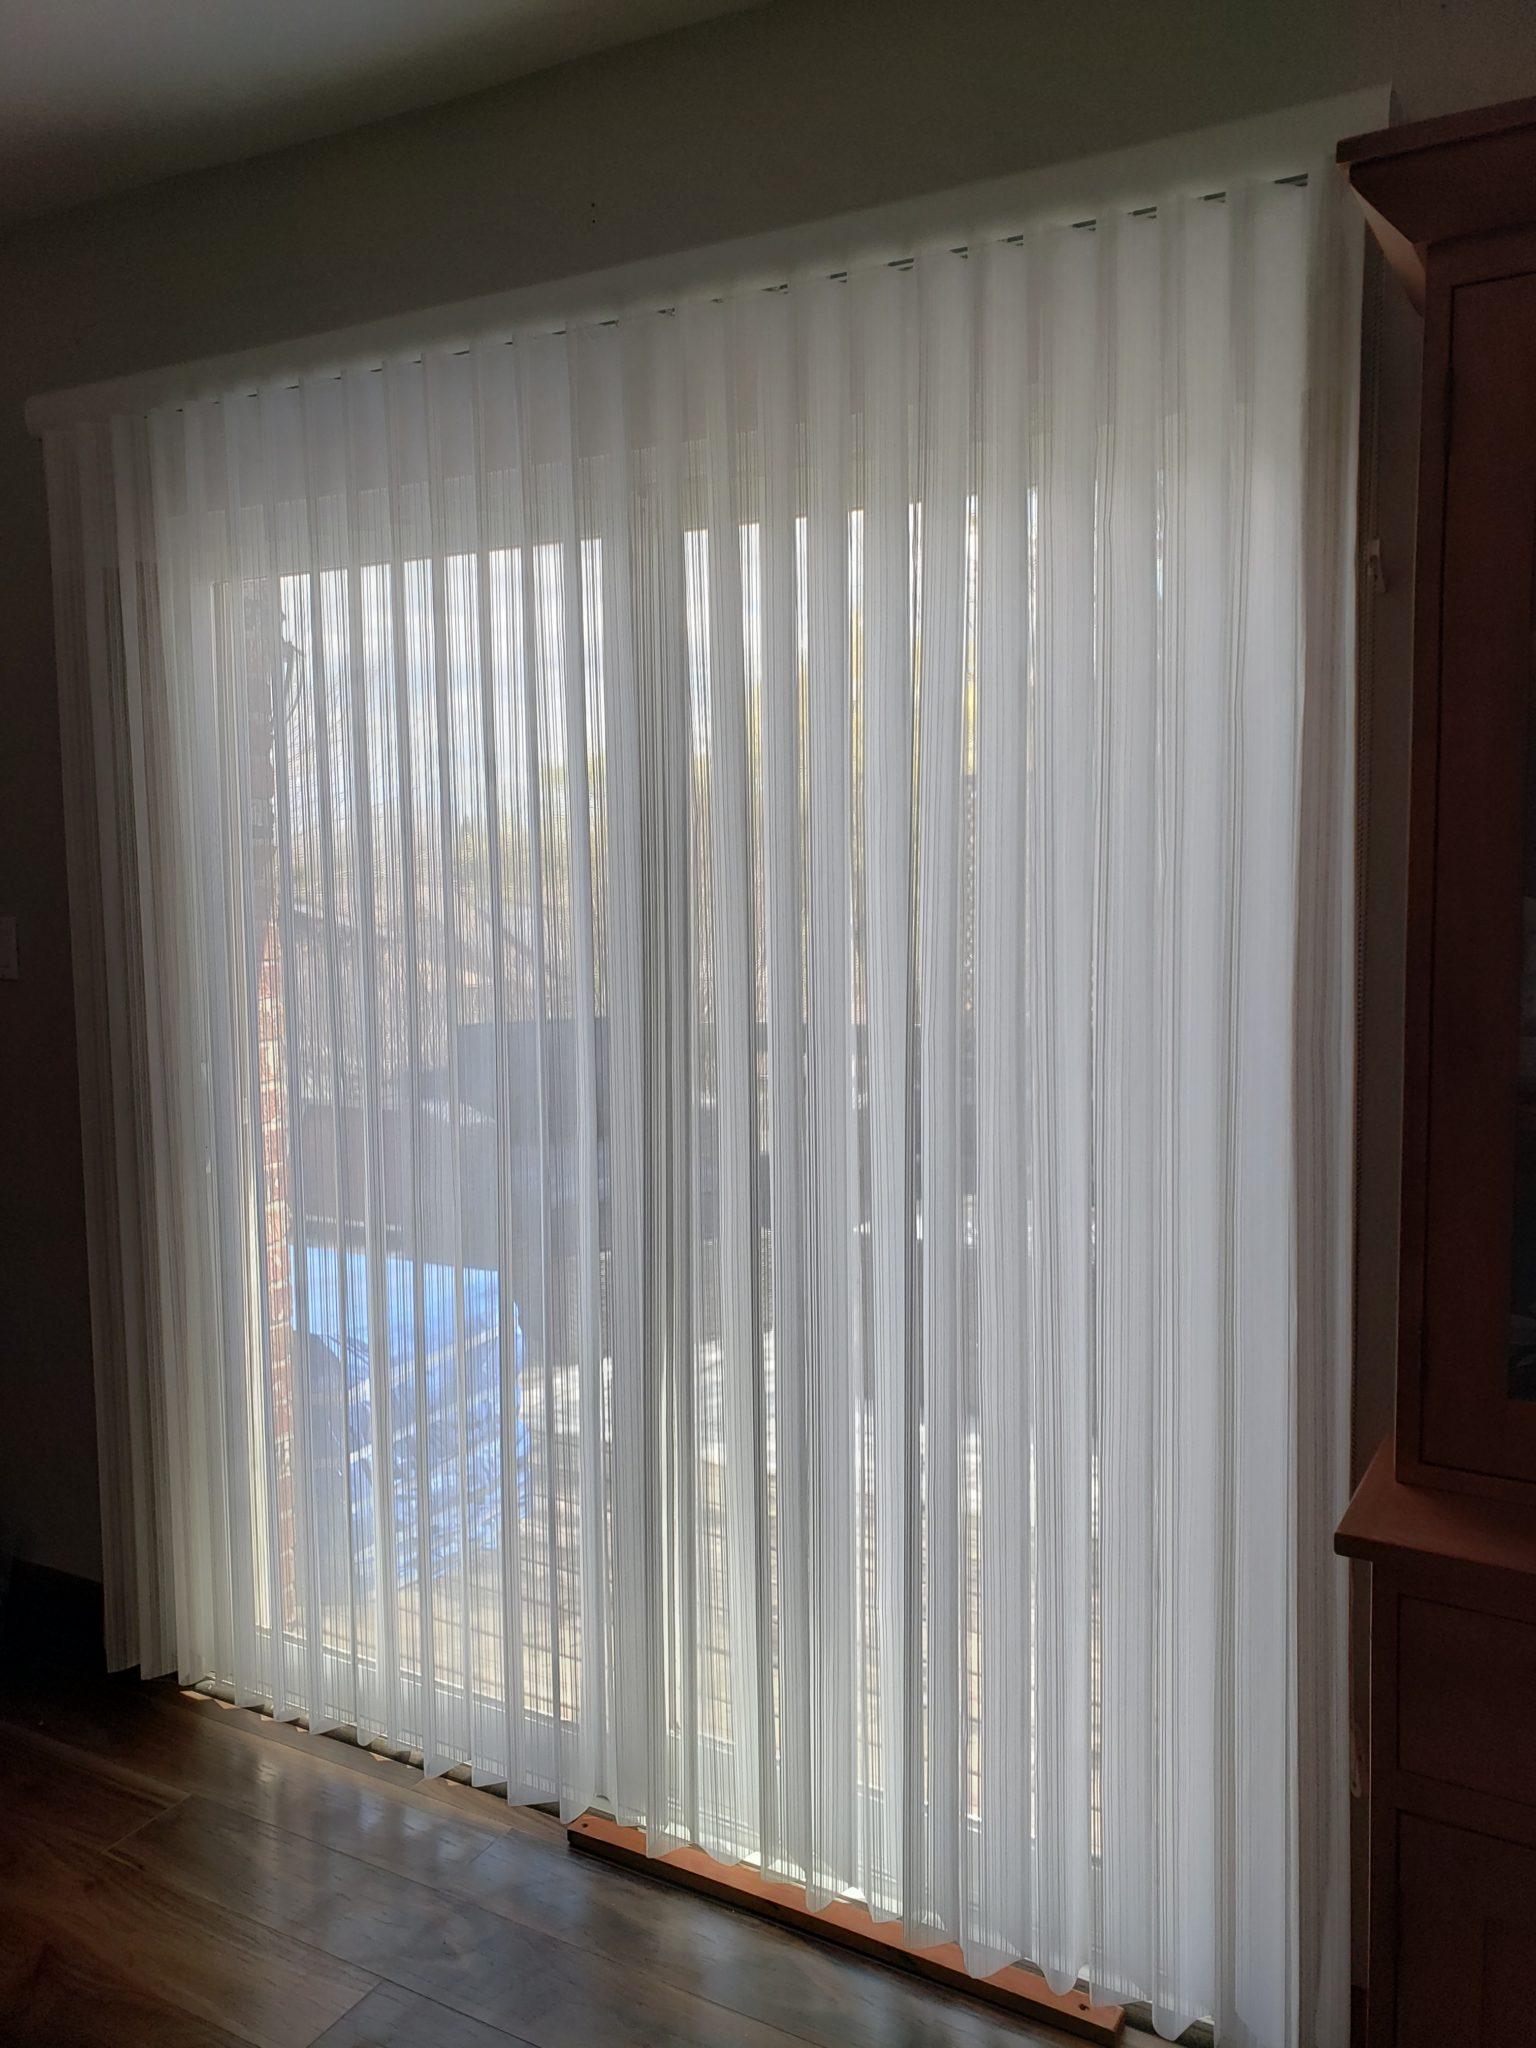 Patio door curtains - After